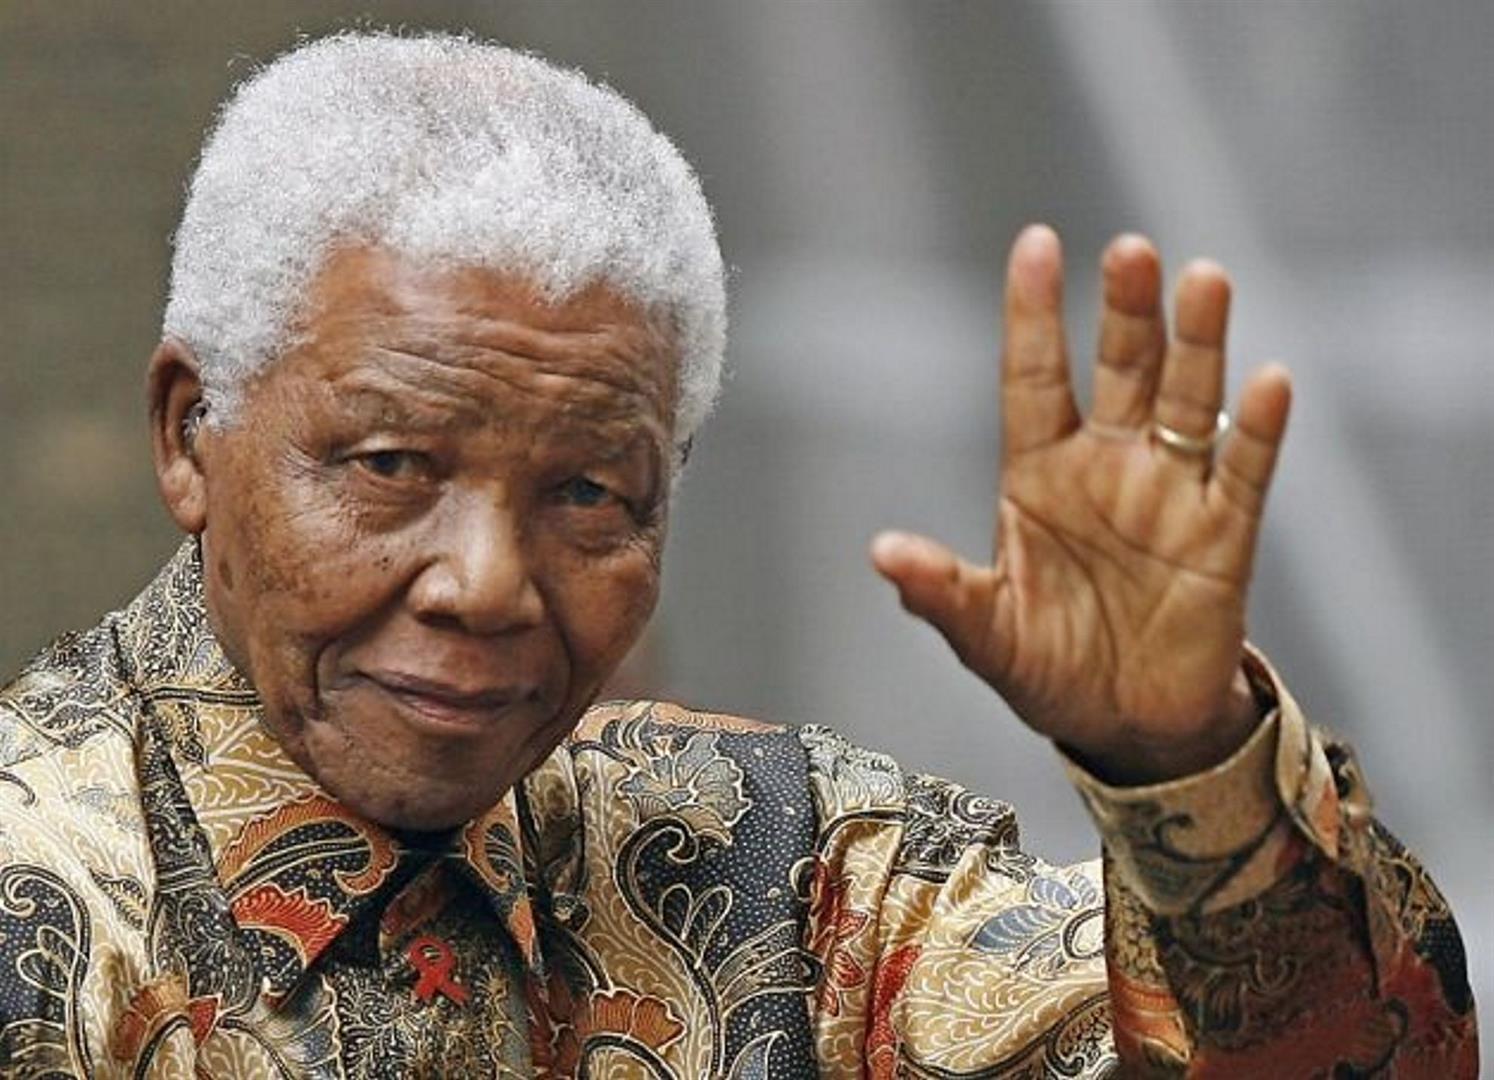 Nelson mandela a life in photographs Nelson Mandela: A Life in Photographs: David Elliot Cohen